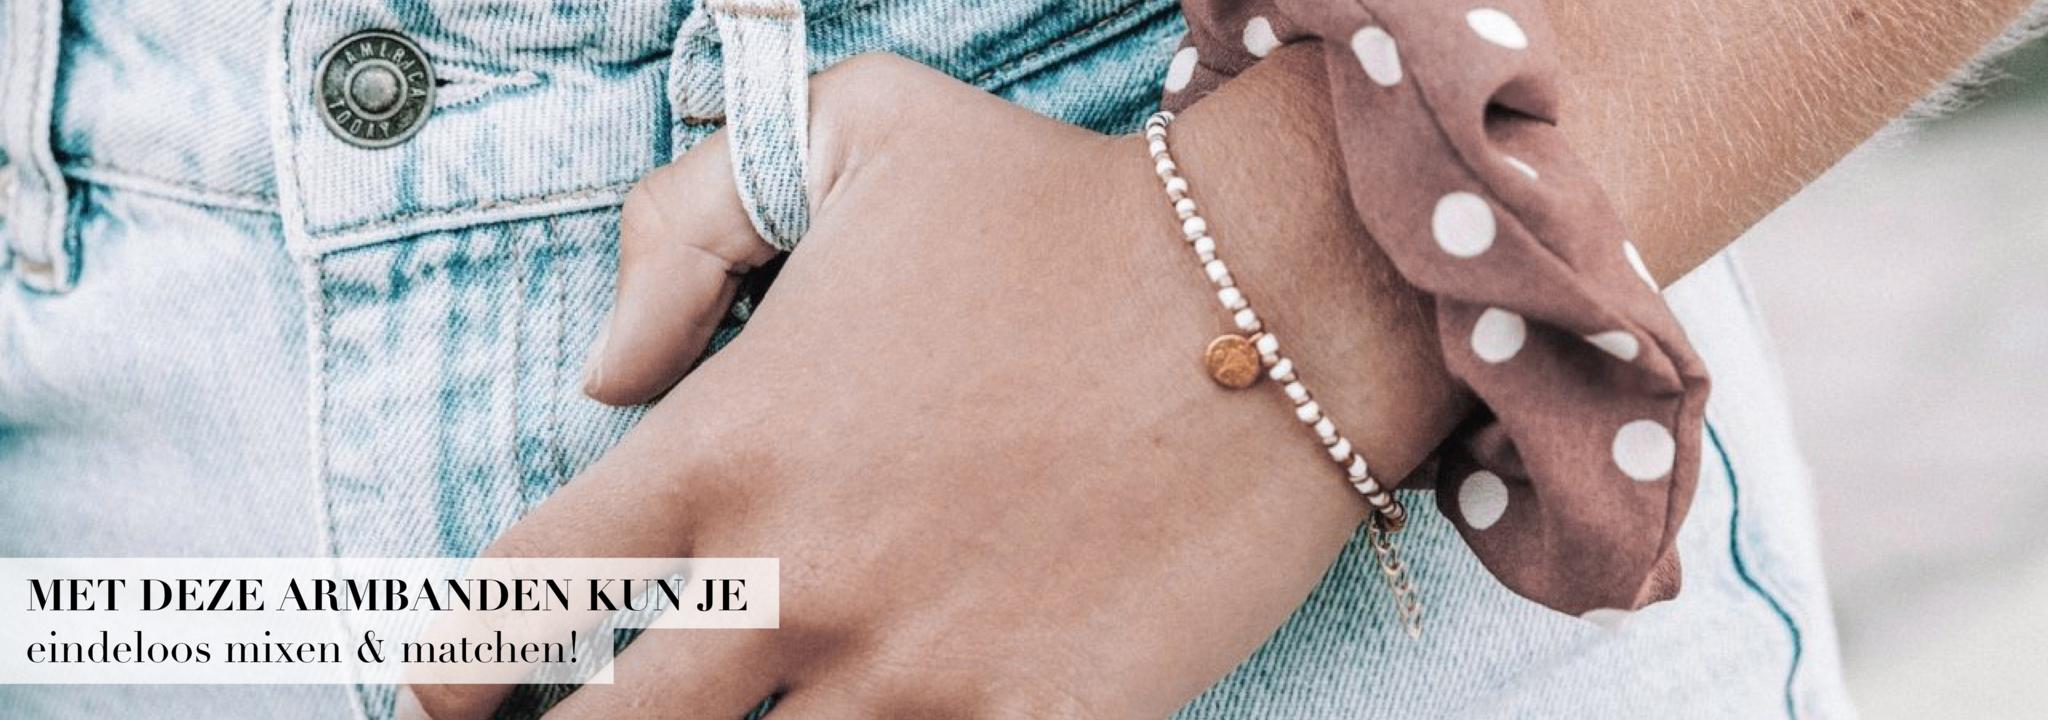 The Trend Girls - Lifestyle Armbanden